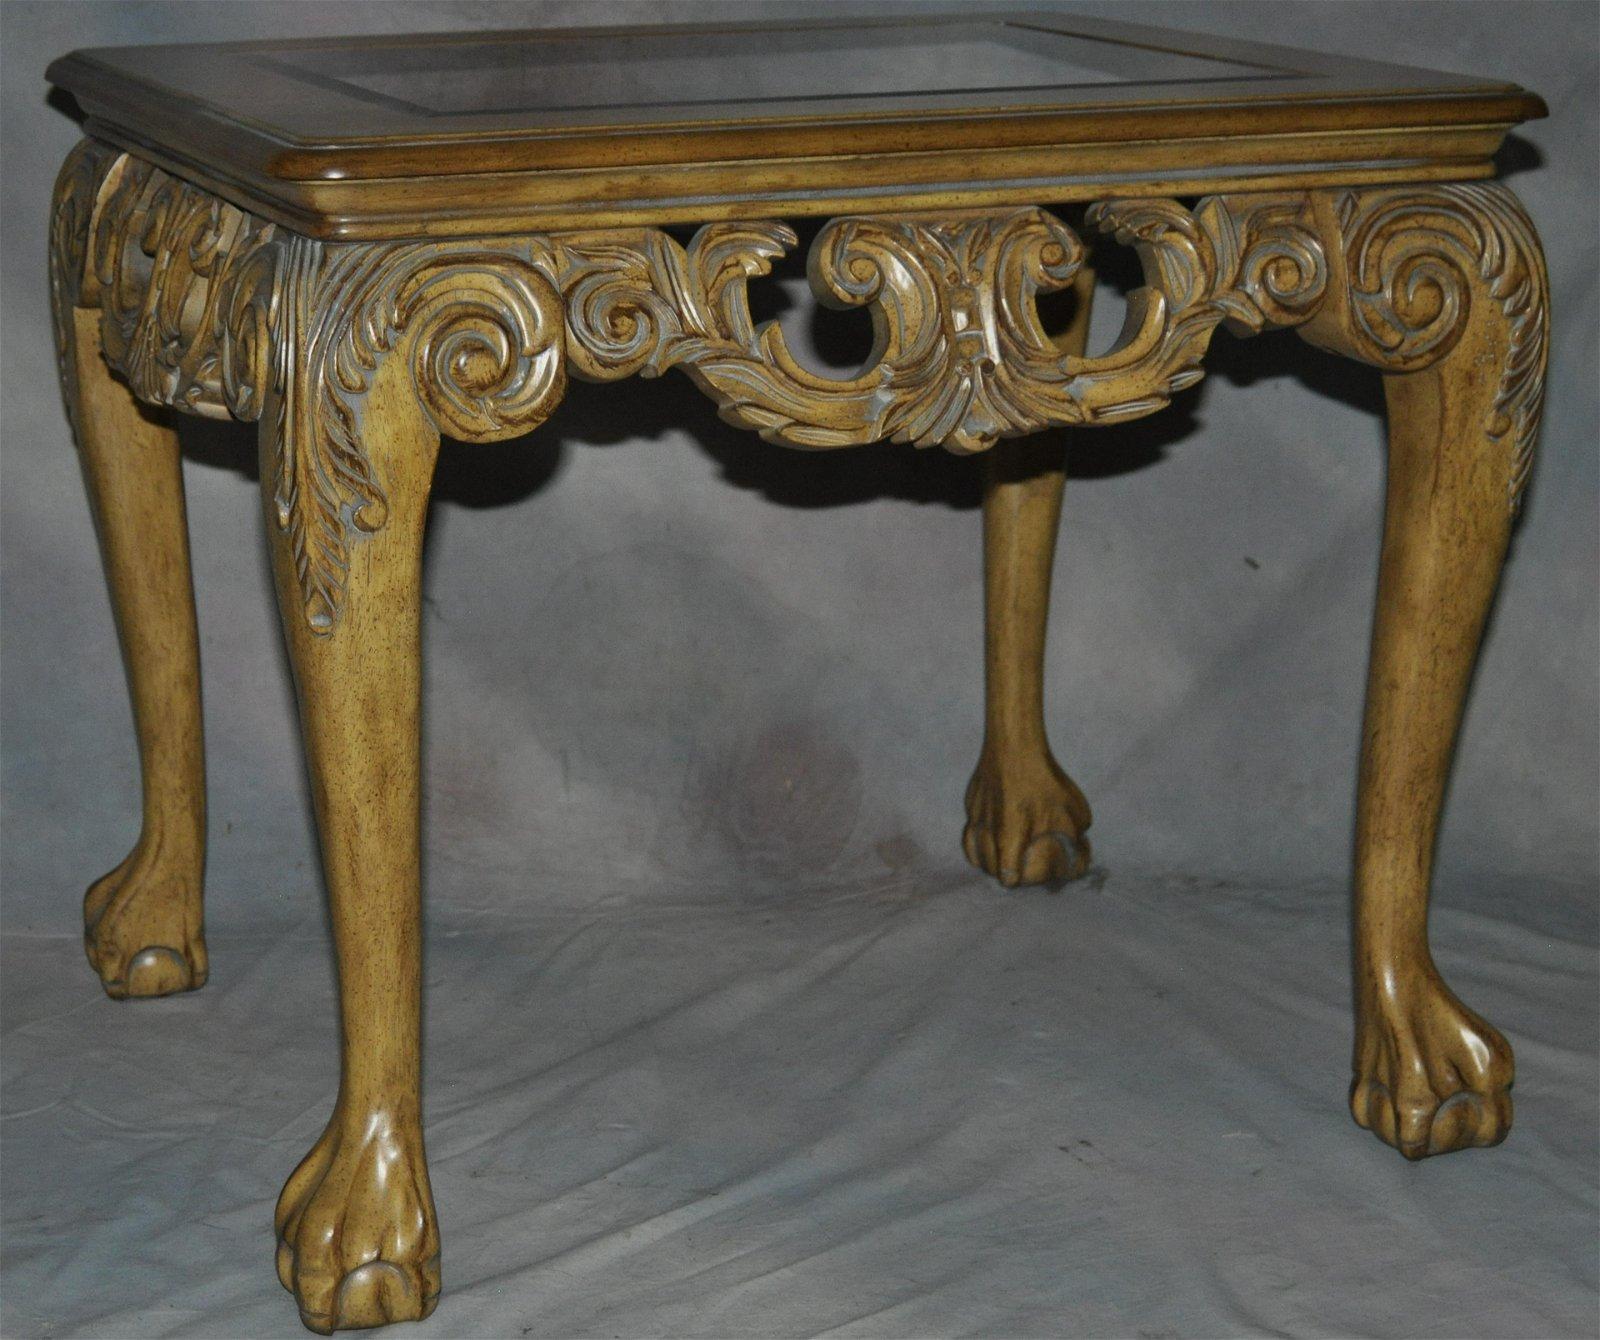 Anglo-Indian Style Burlwood Table